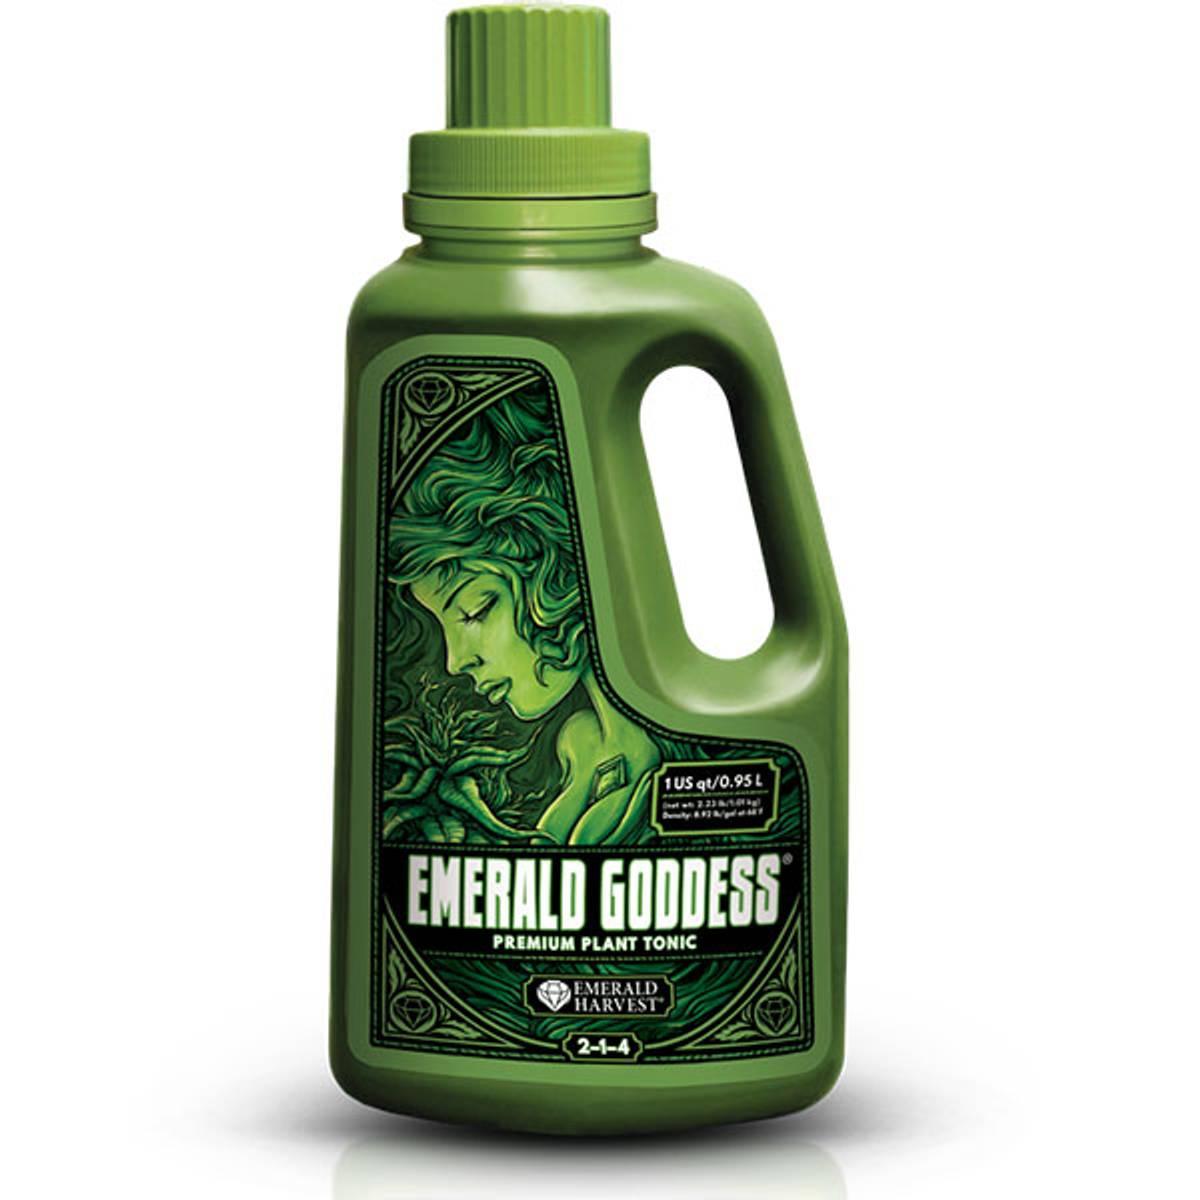 Emerald Goddess 0,95 L, Emerald Harvest